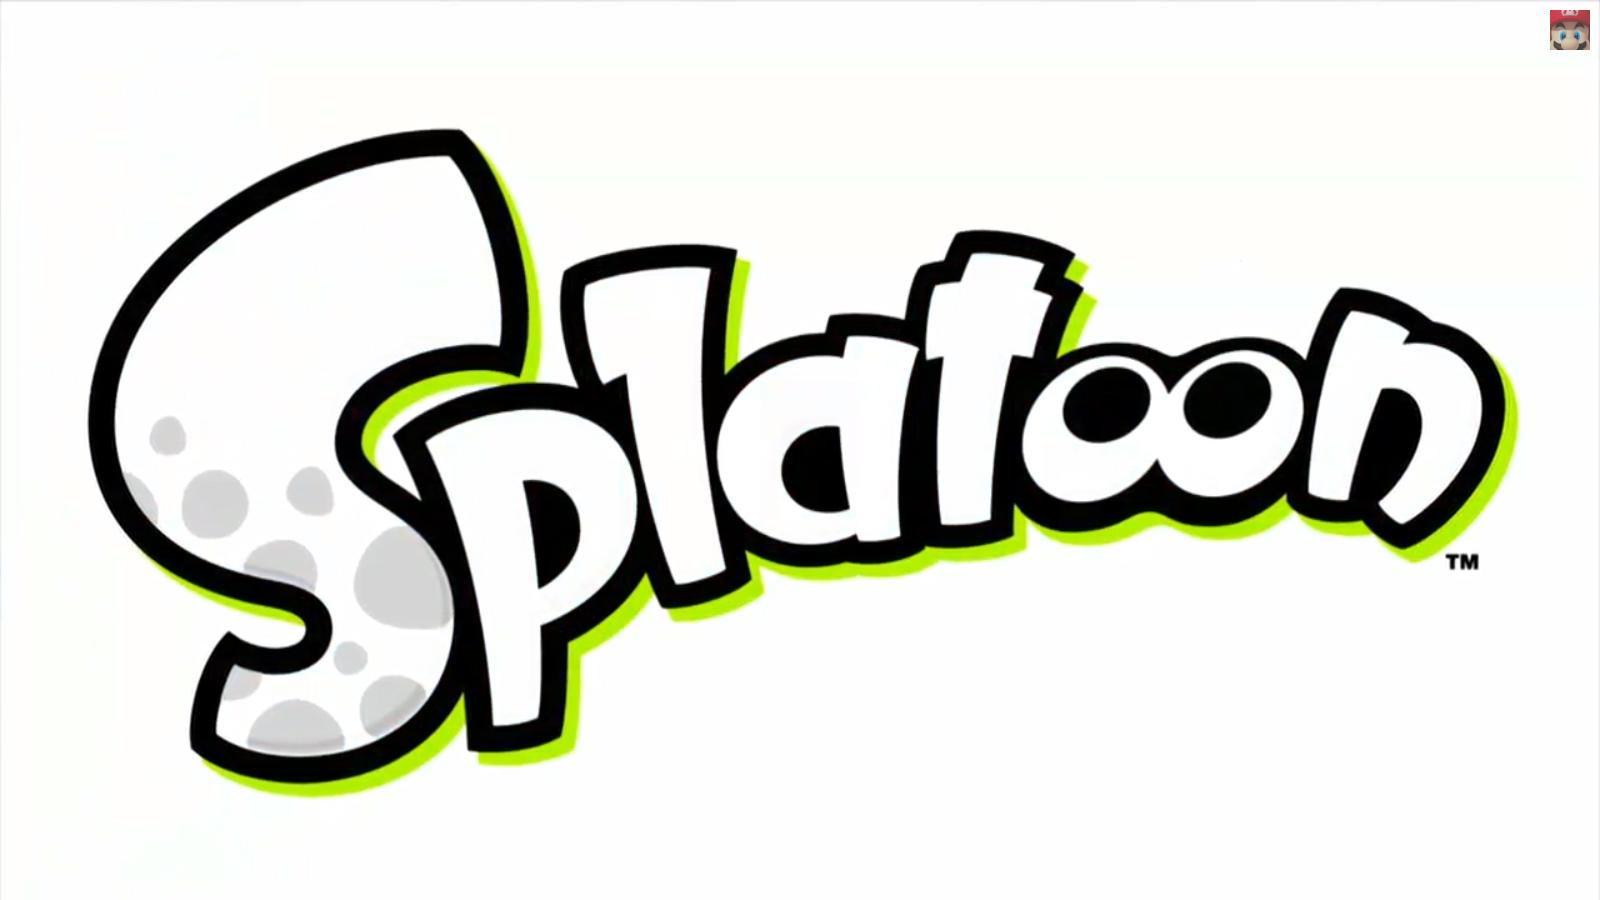 Splatoon clipart image Free Squid Clipart, Download Free Clip Art, Free Clip Art on ... image